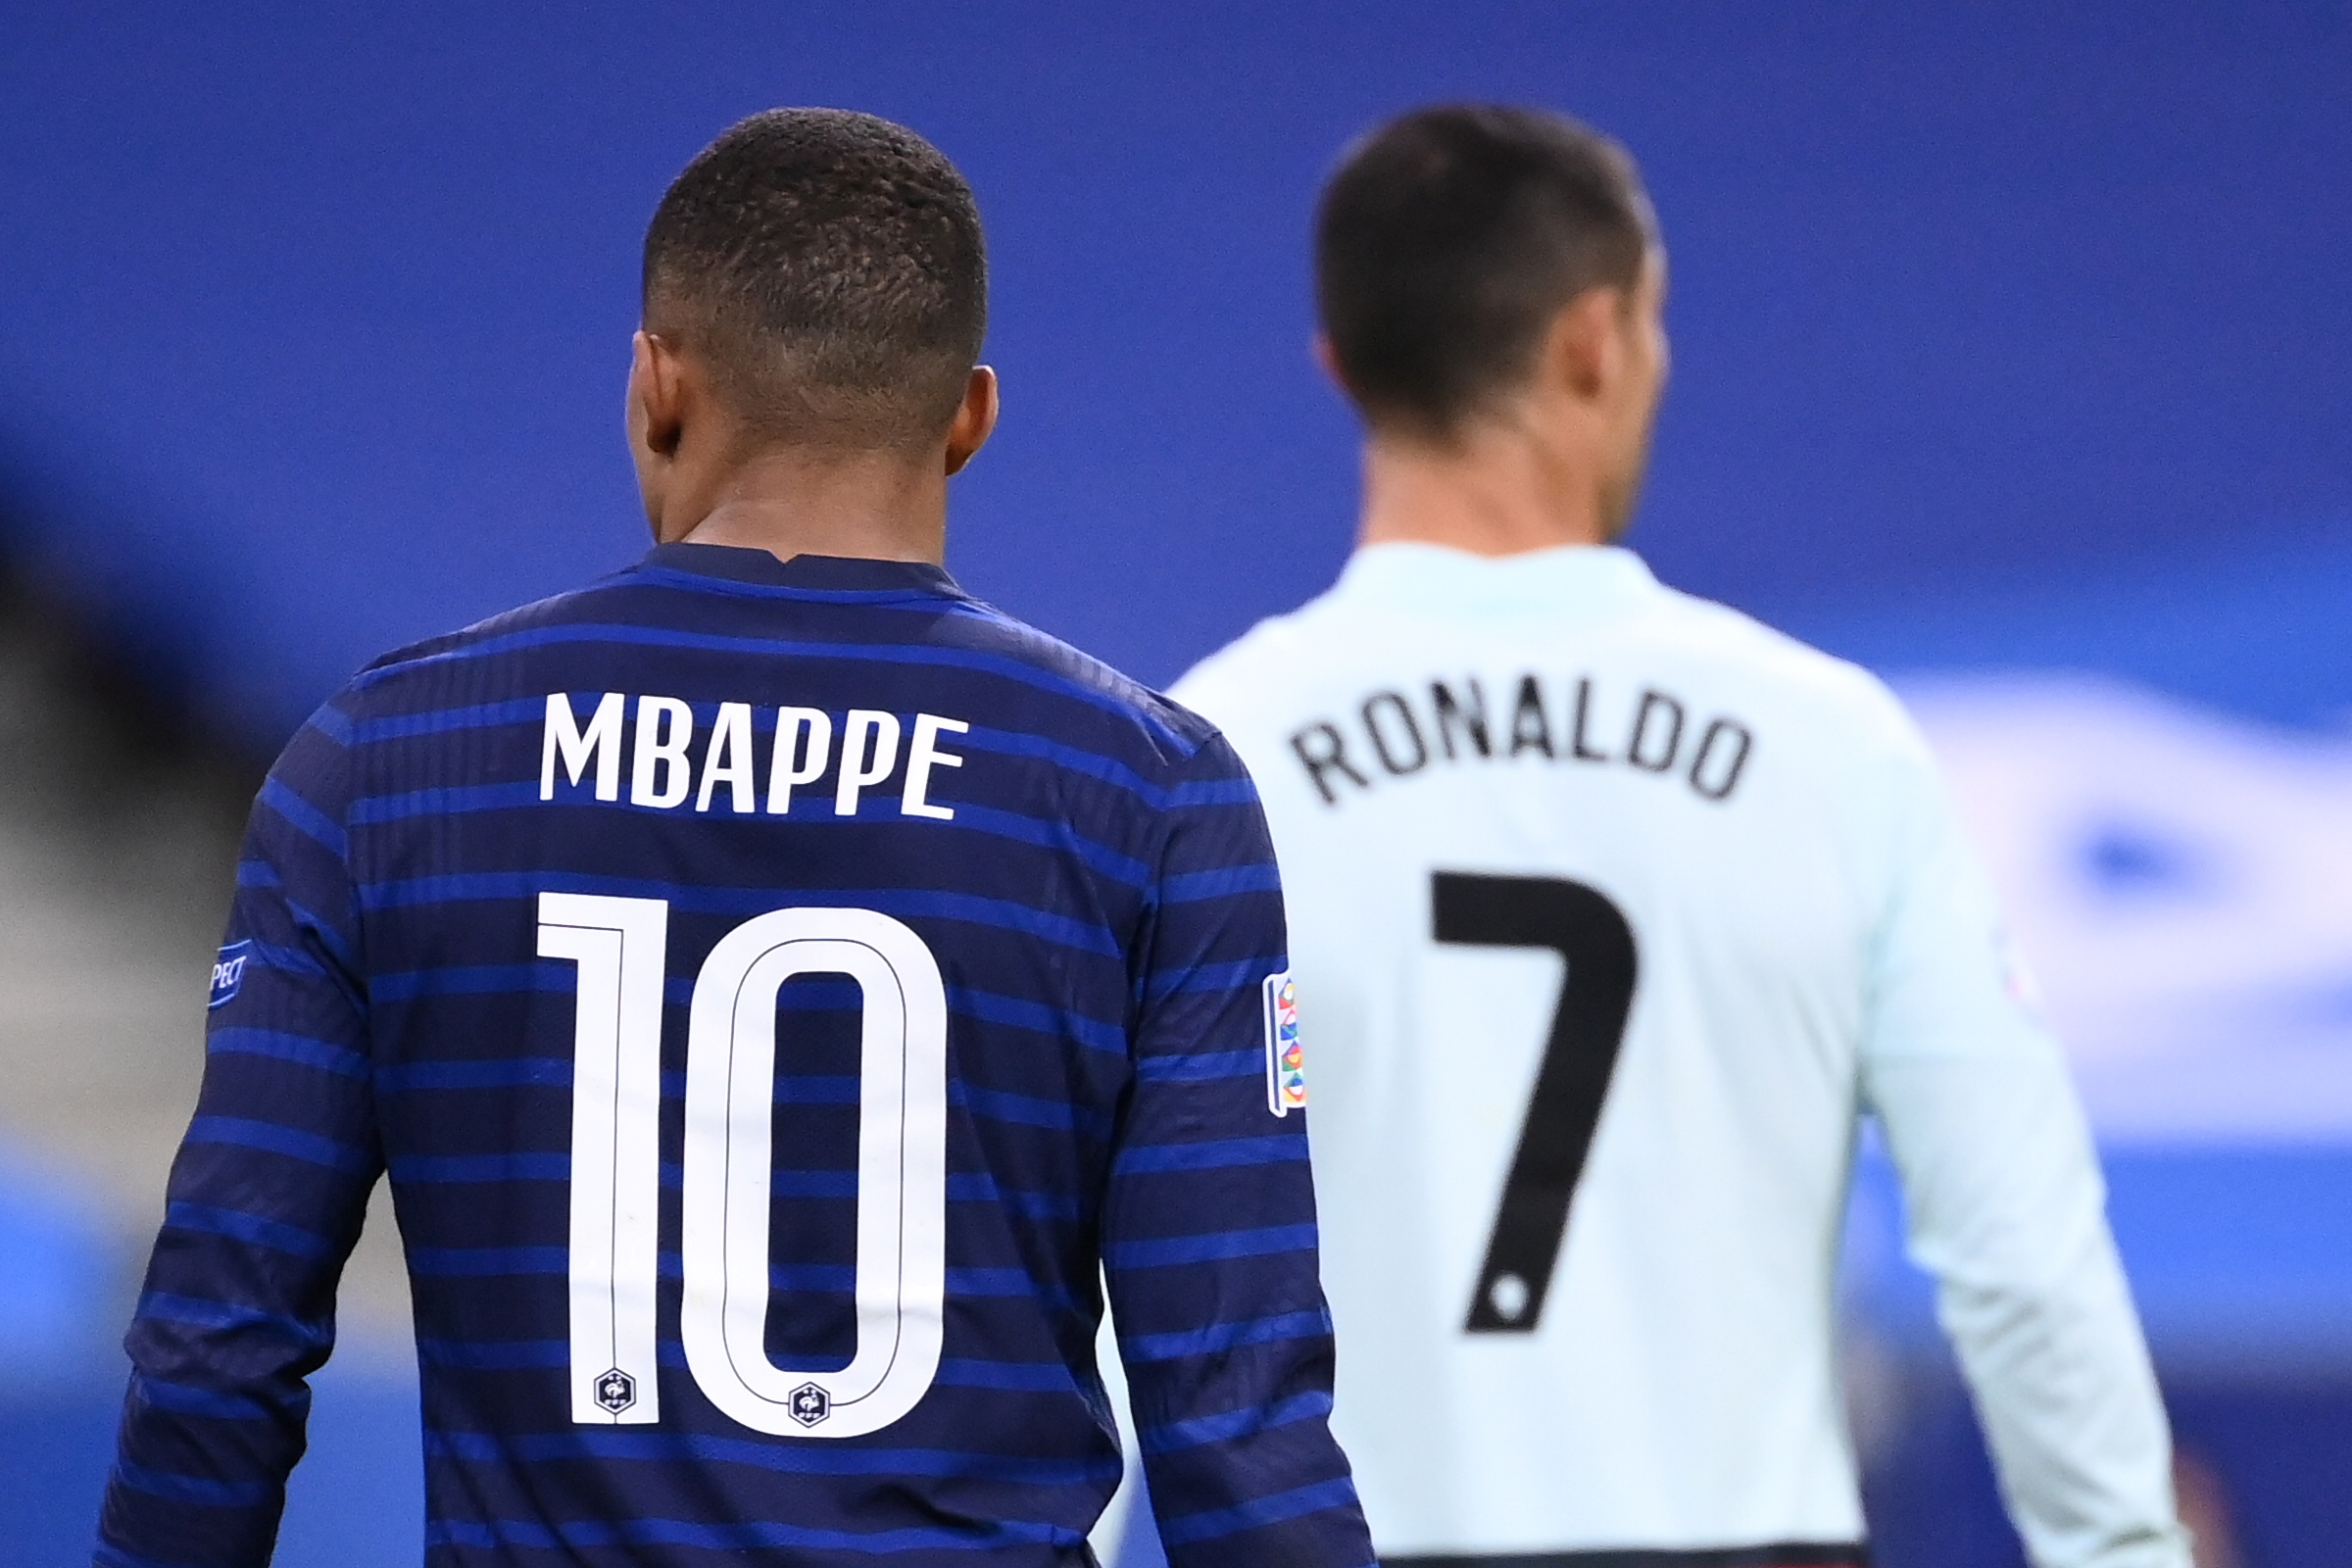 Kylian Mbappe walks with Cristiano Ronaldo - France vs Portugal - Euro 2020